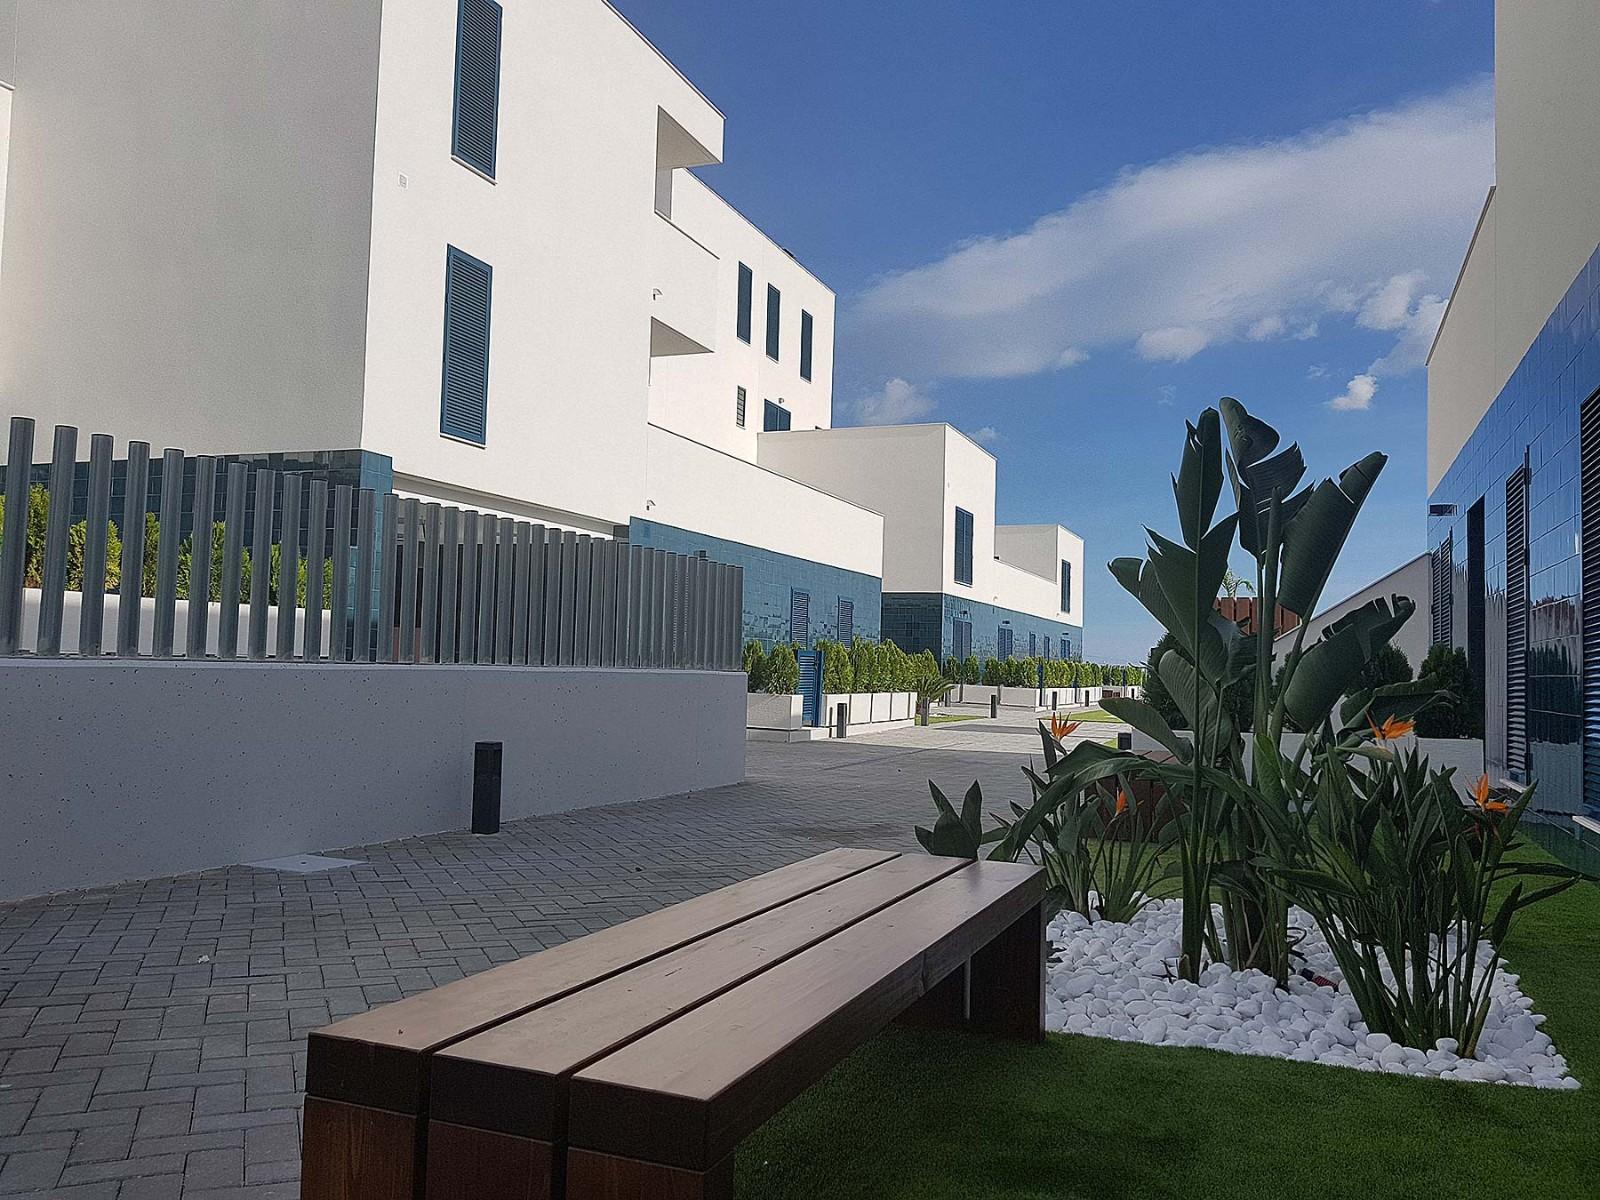 Фотогалерея Апартаменты в Ориуэла-Коста, 1+1, 2+1, 3+1